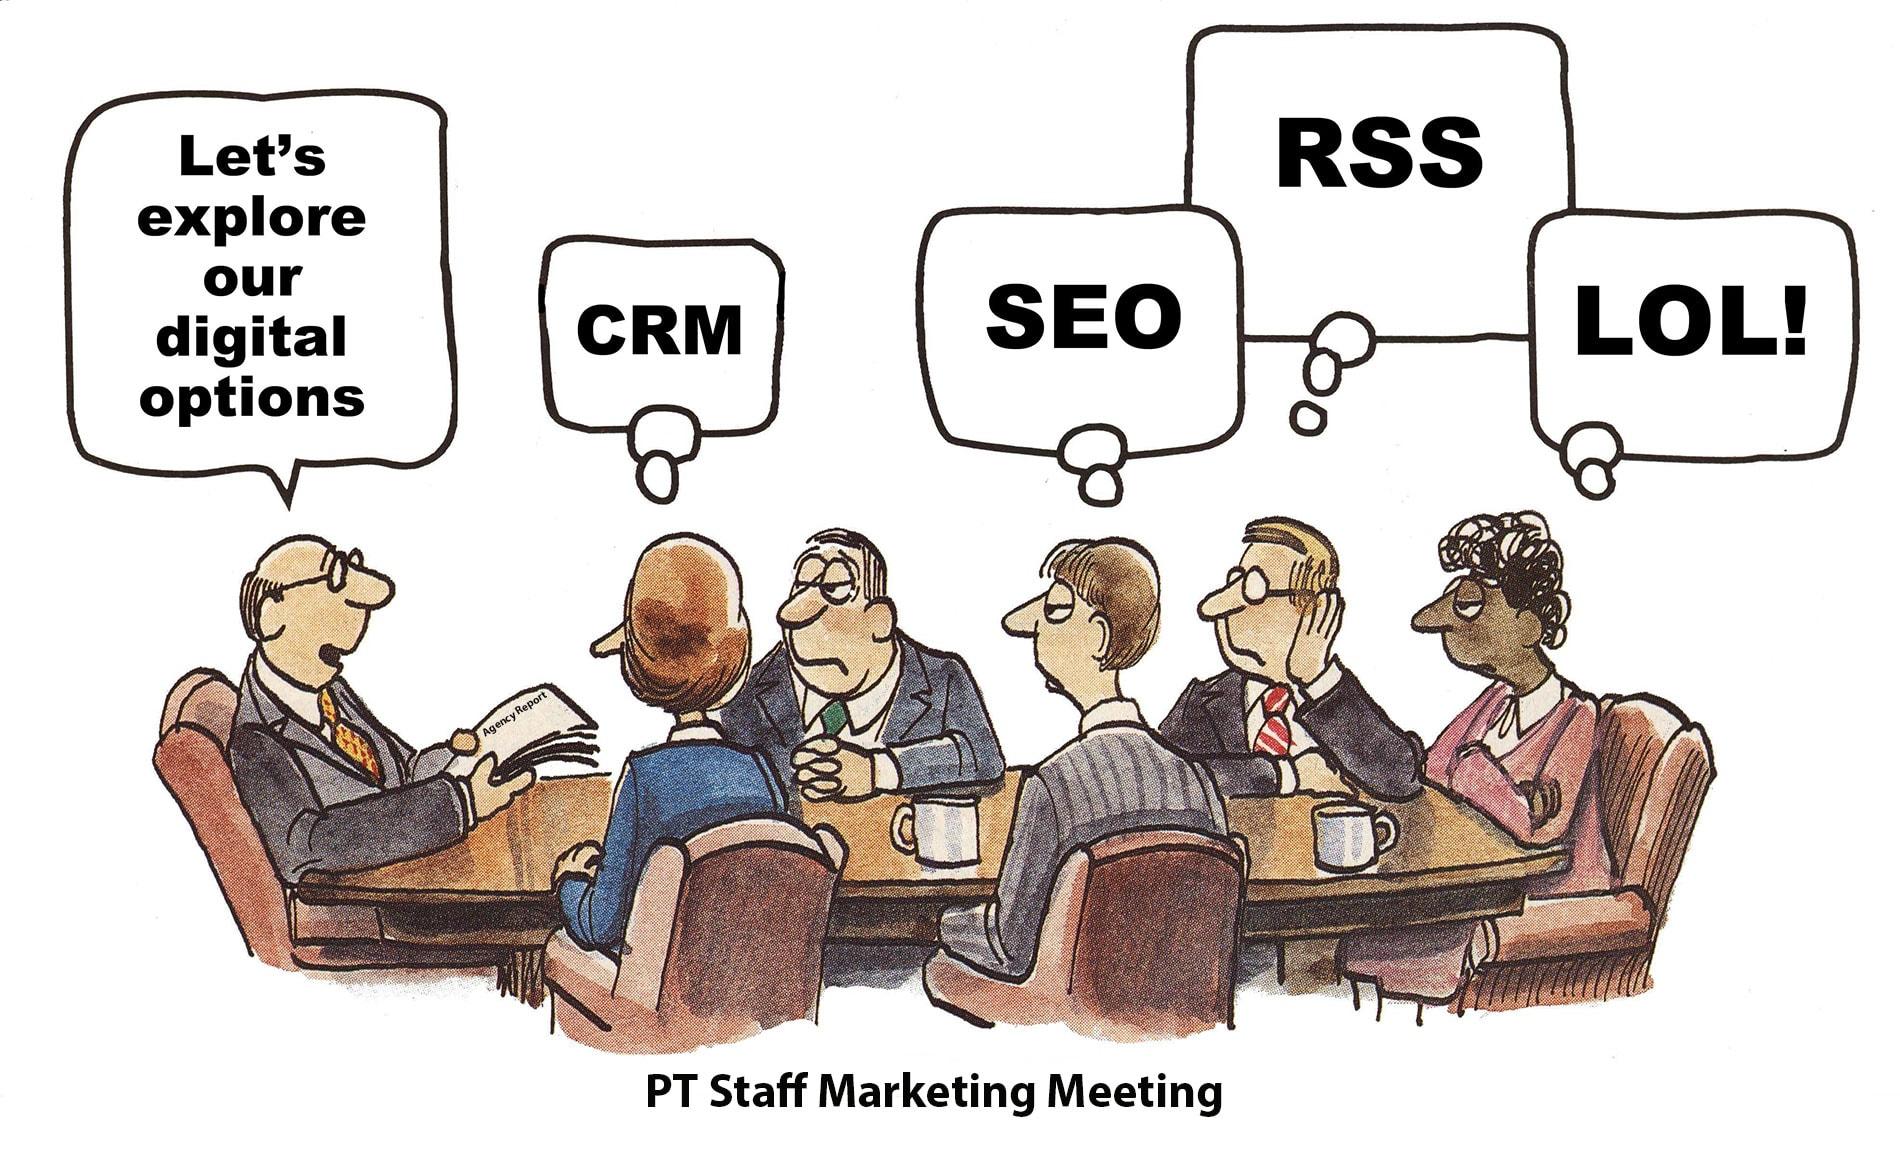 PT Website article feature image - marketing meeting cartoon